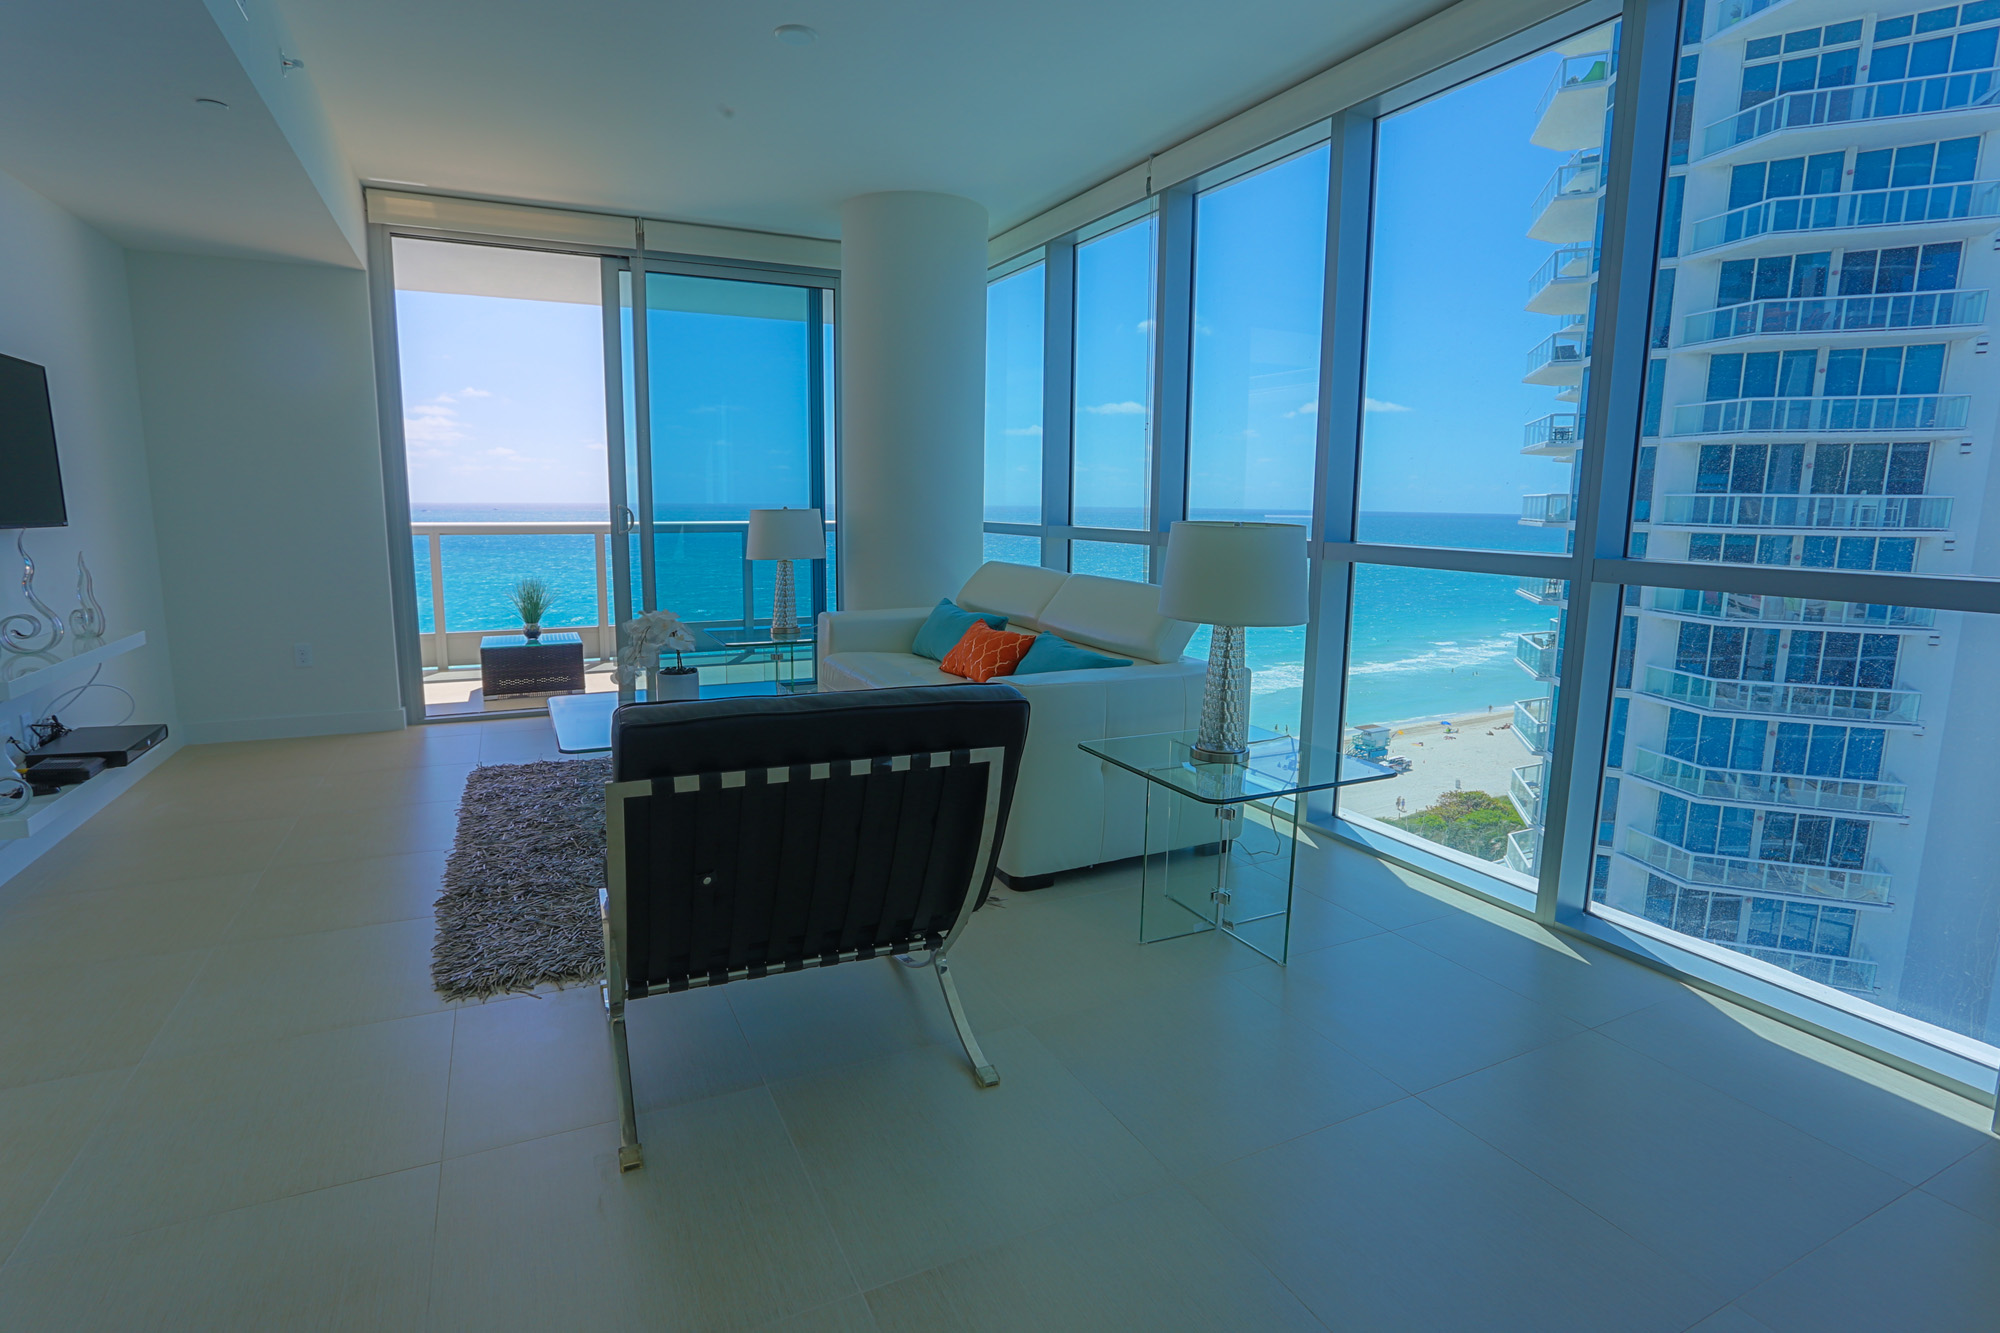 Suite life miami apartment miami beach cheap hotels for Epic apartments miami